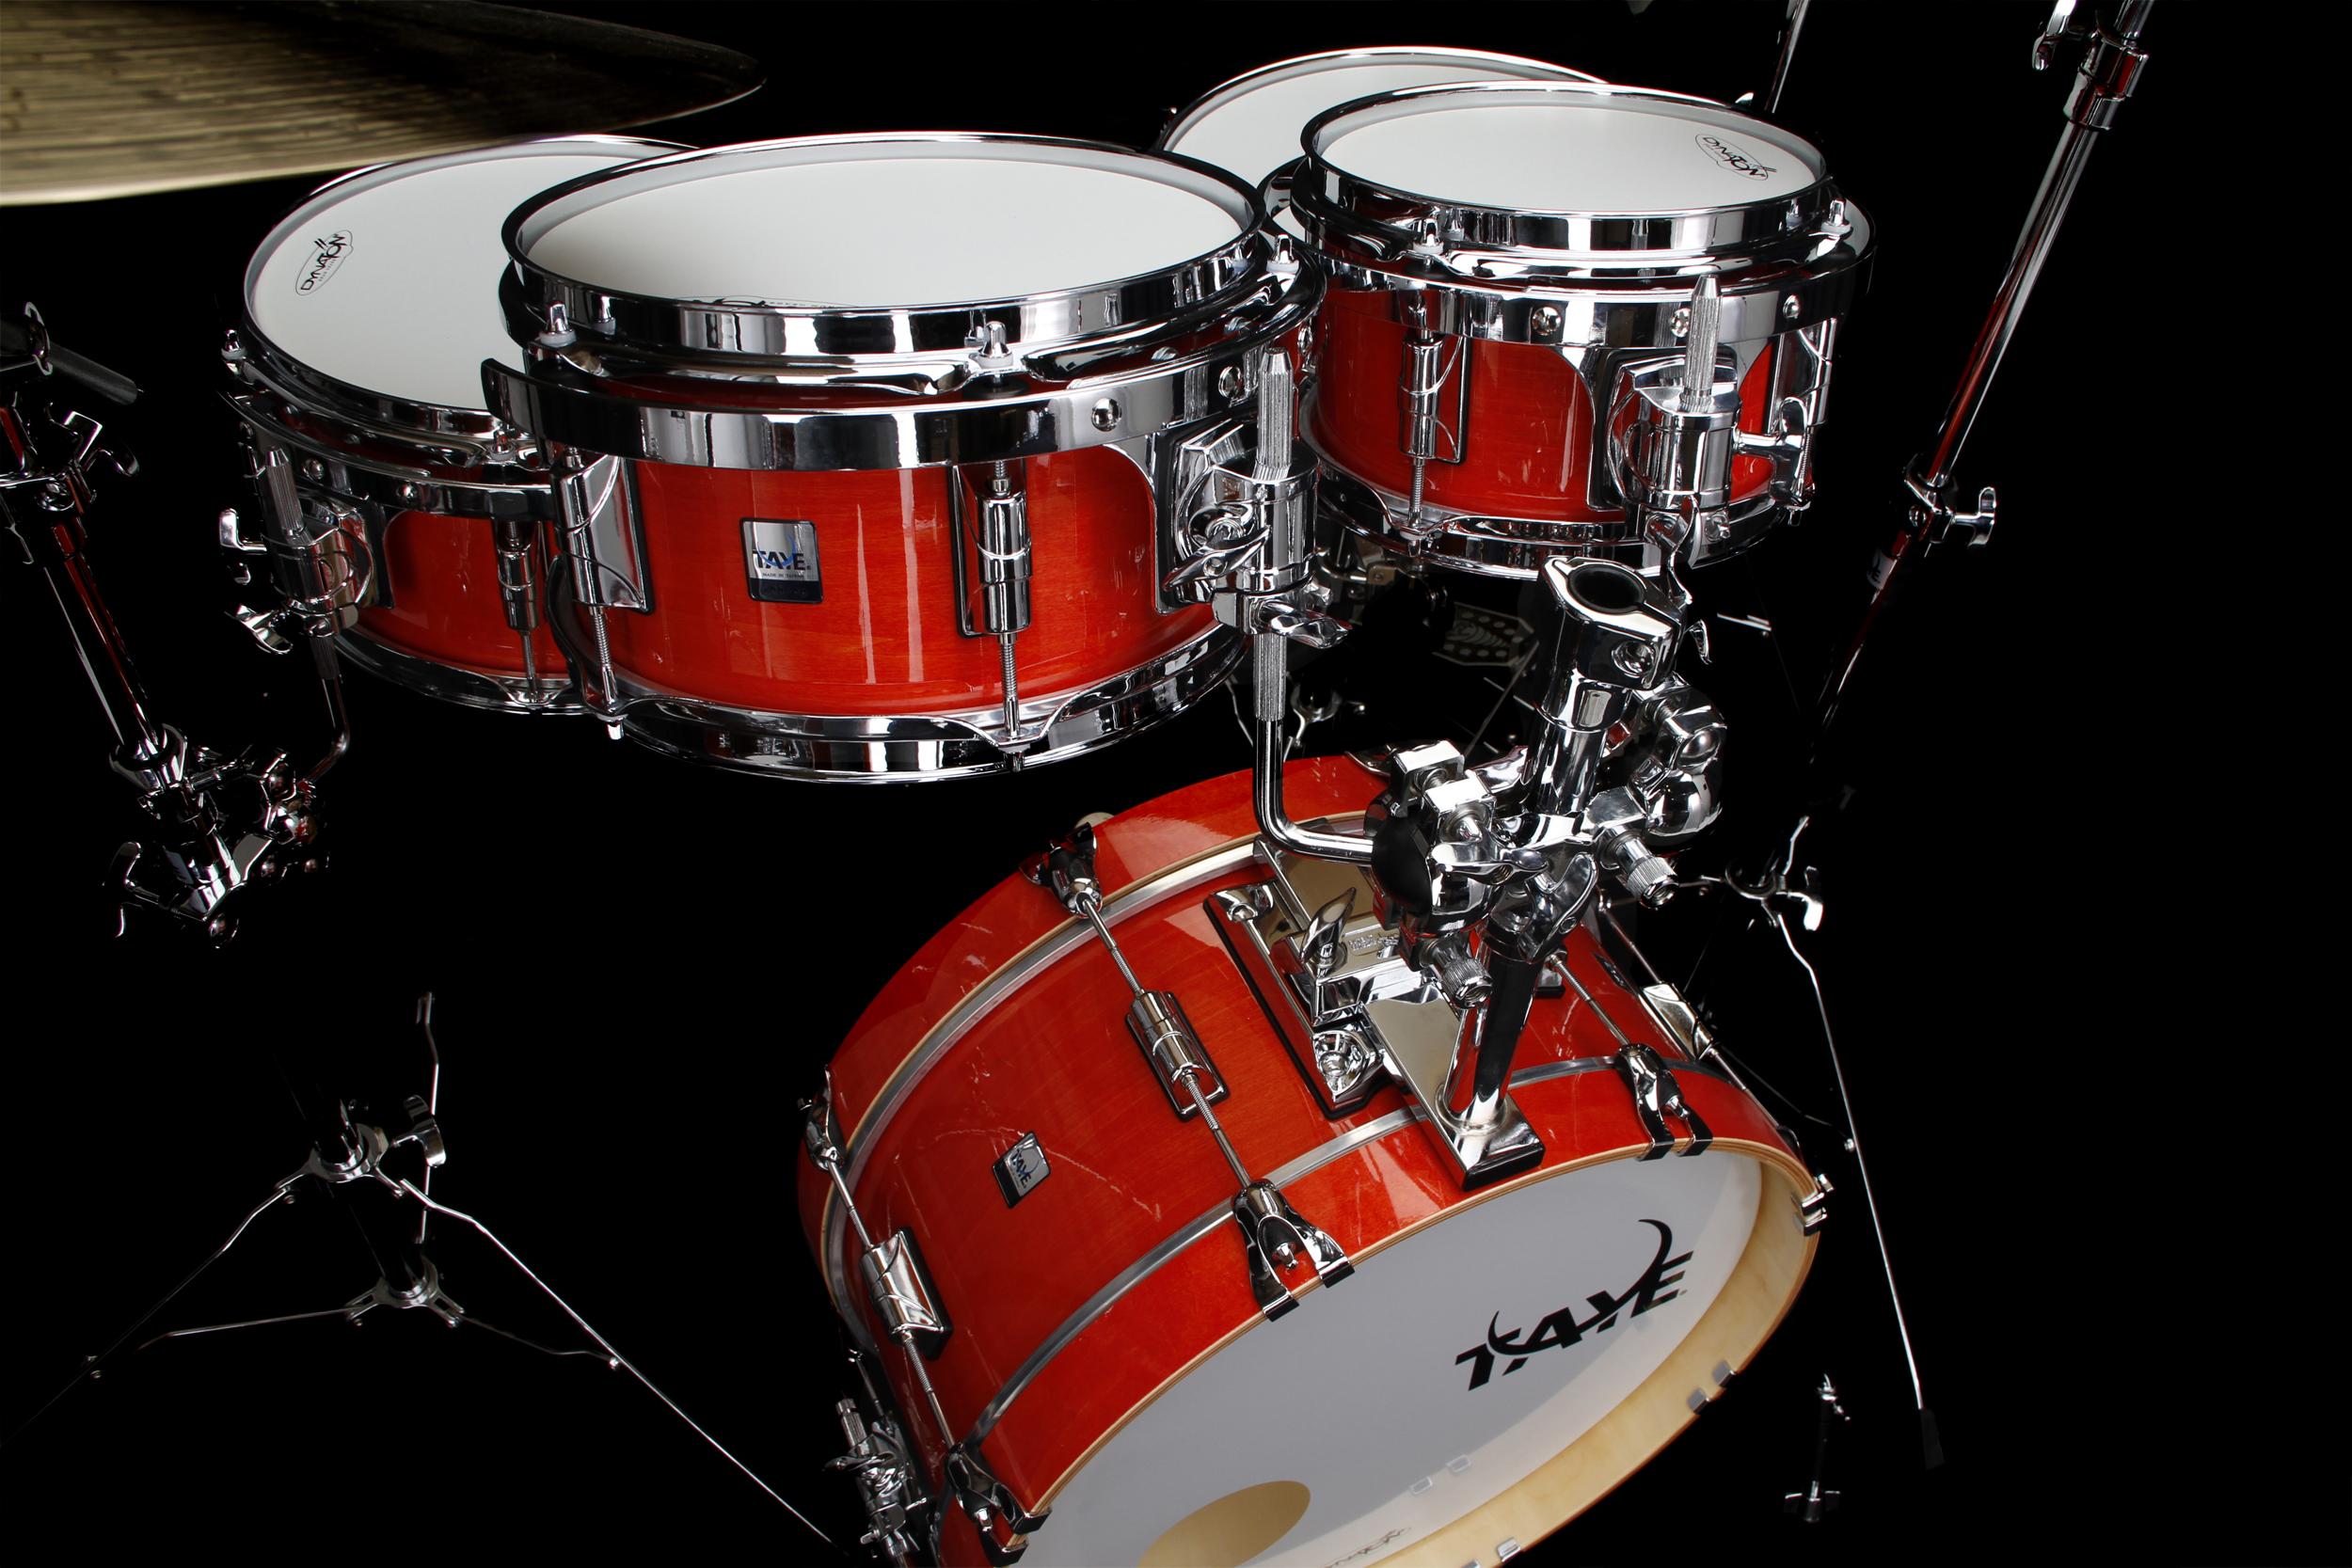 http://www.tayedrums.com/drum_sets/gokit/images/gk518fds.jpg